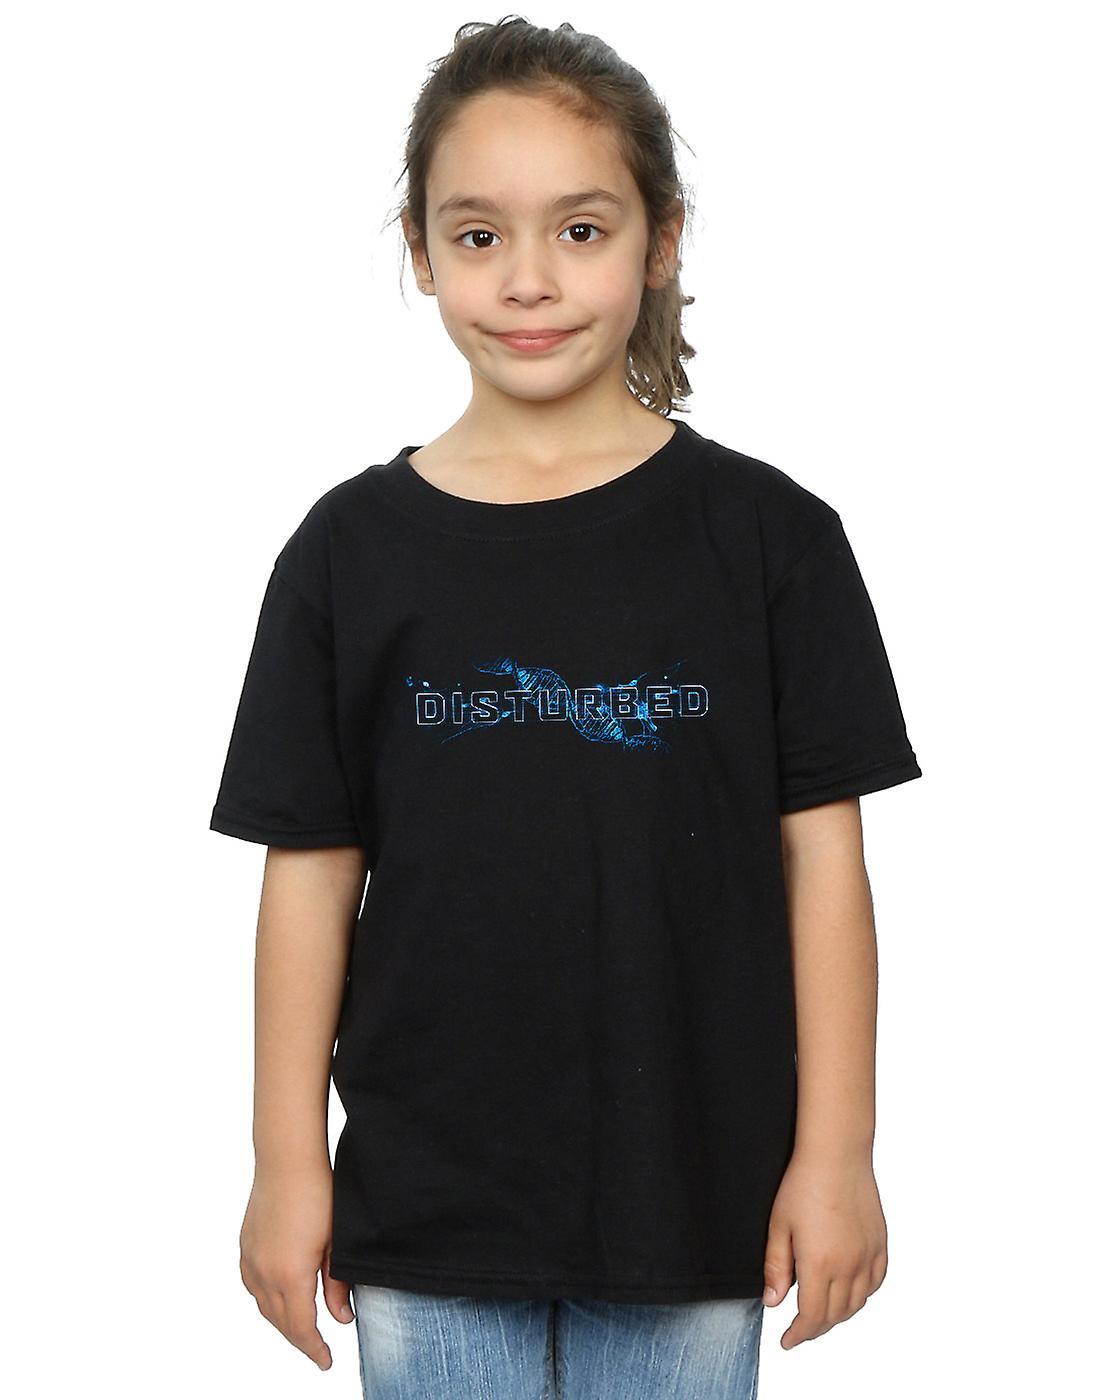 Disturbed Girls Blue Blood T-Shirt